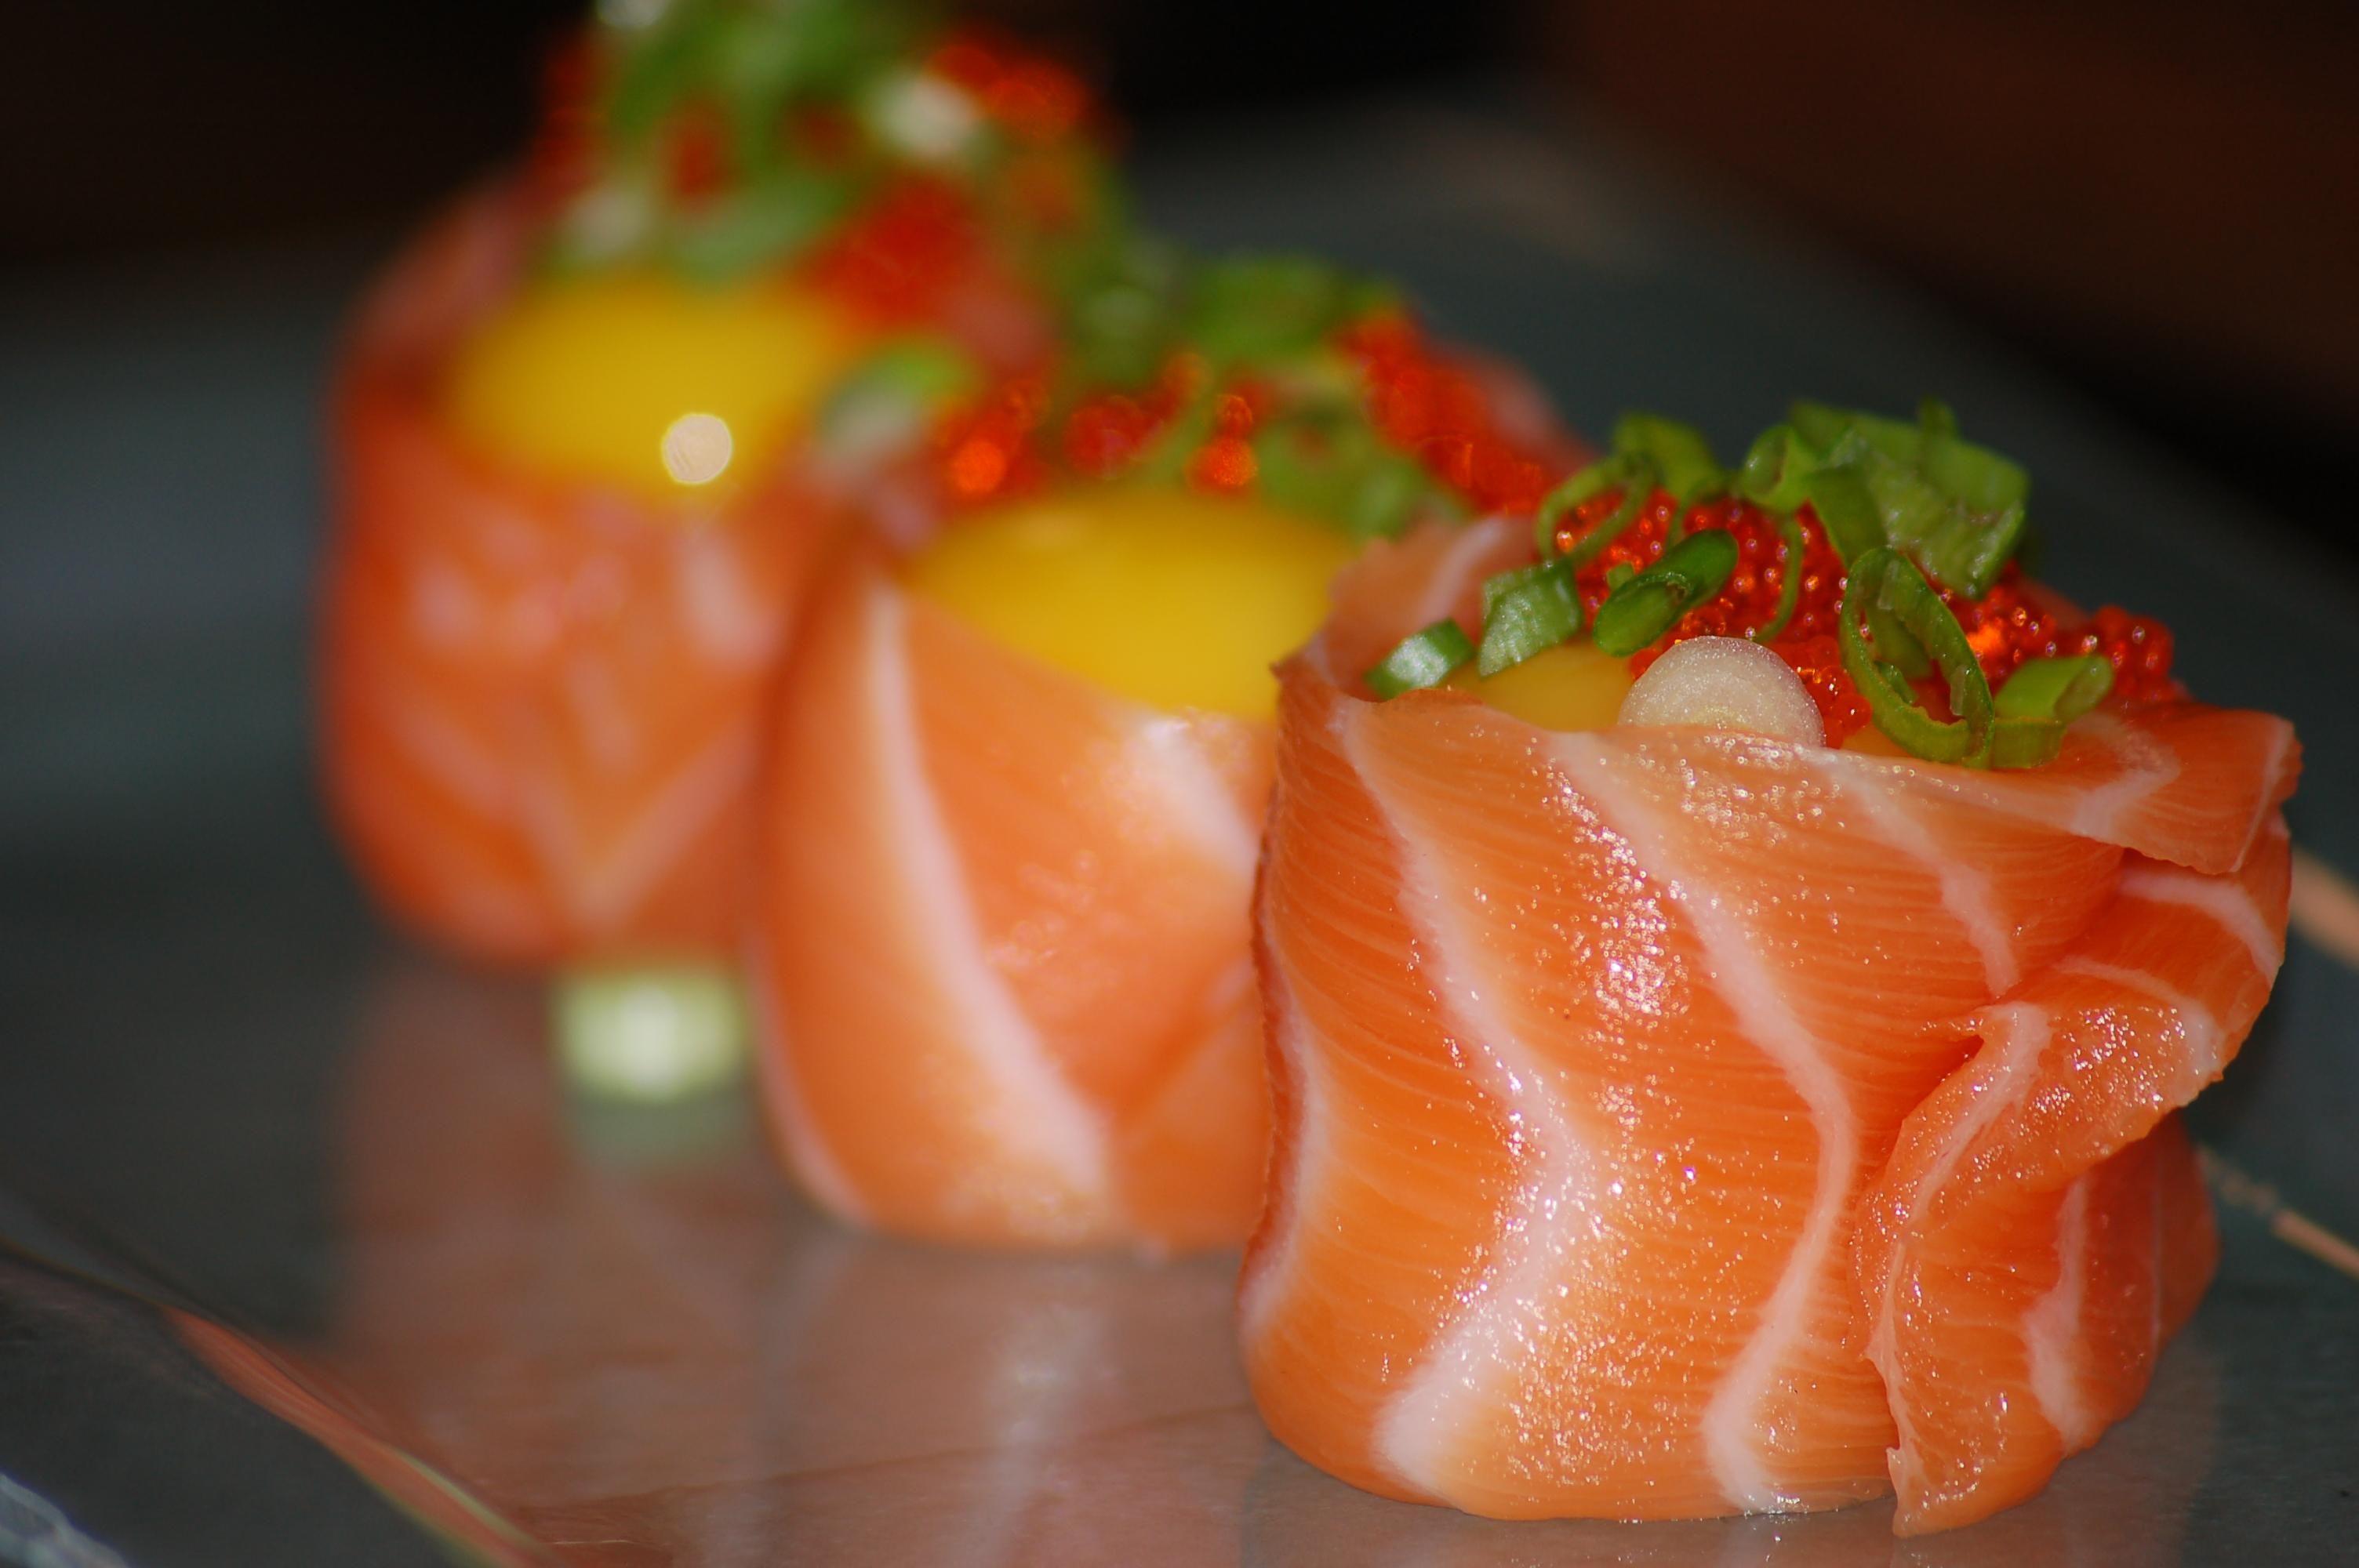 Sushi Bar & Restaurante amo.te Tejo.  Museu da Electricidade. Lisboa. Info/Reservas 213640627 amote@clix.pt www.facebook.com/amote.pt  amo.te & Co. 2014.